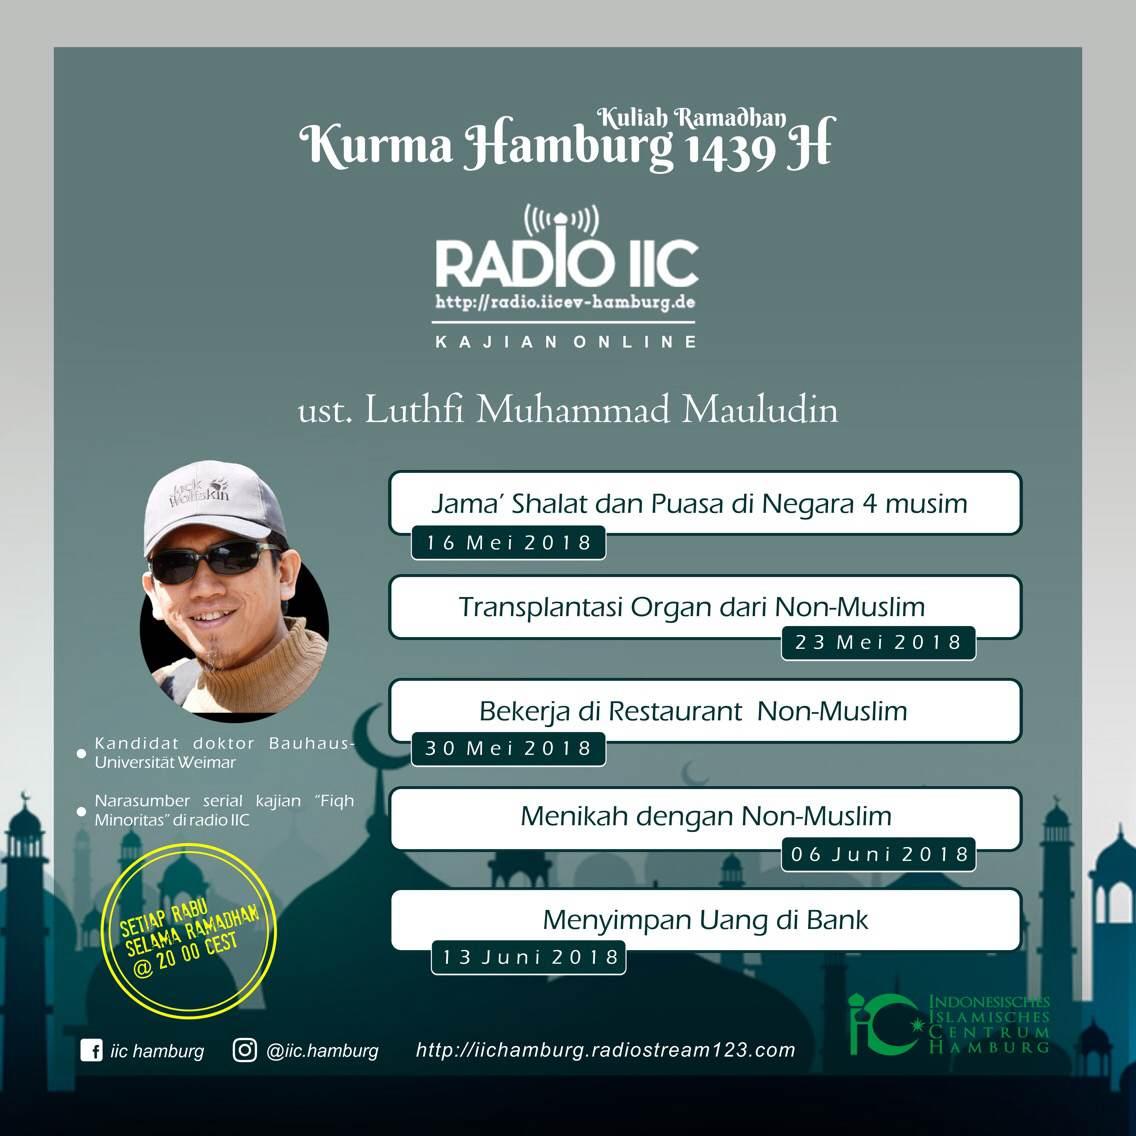 Kurma (Kuliah Ramadan 1439H)